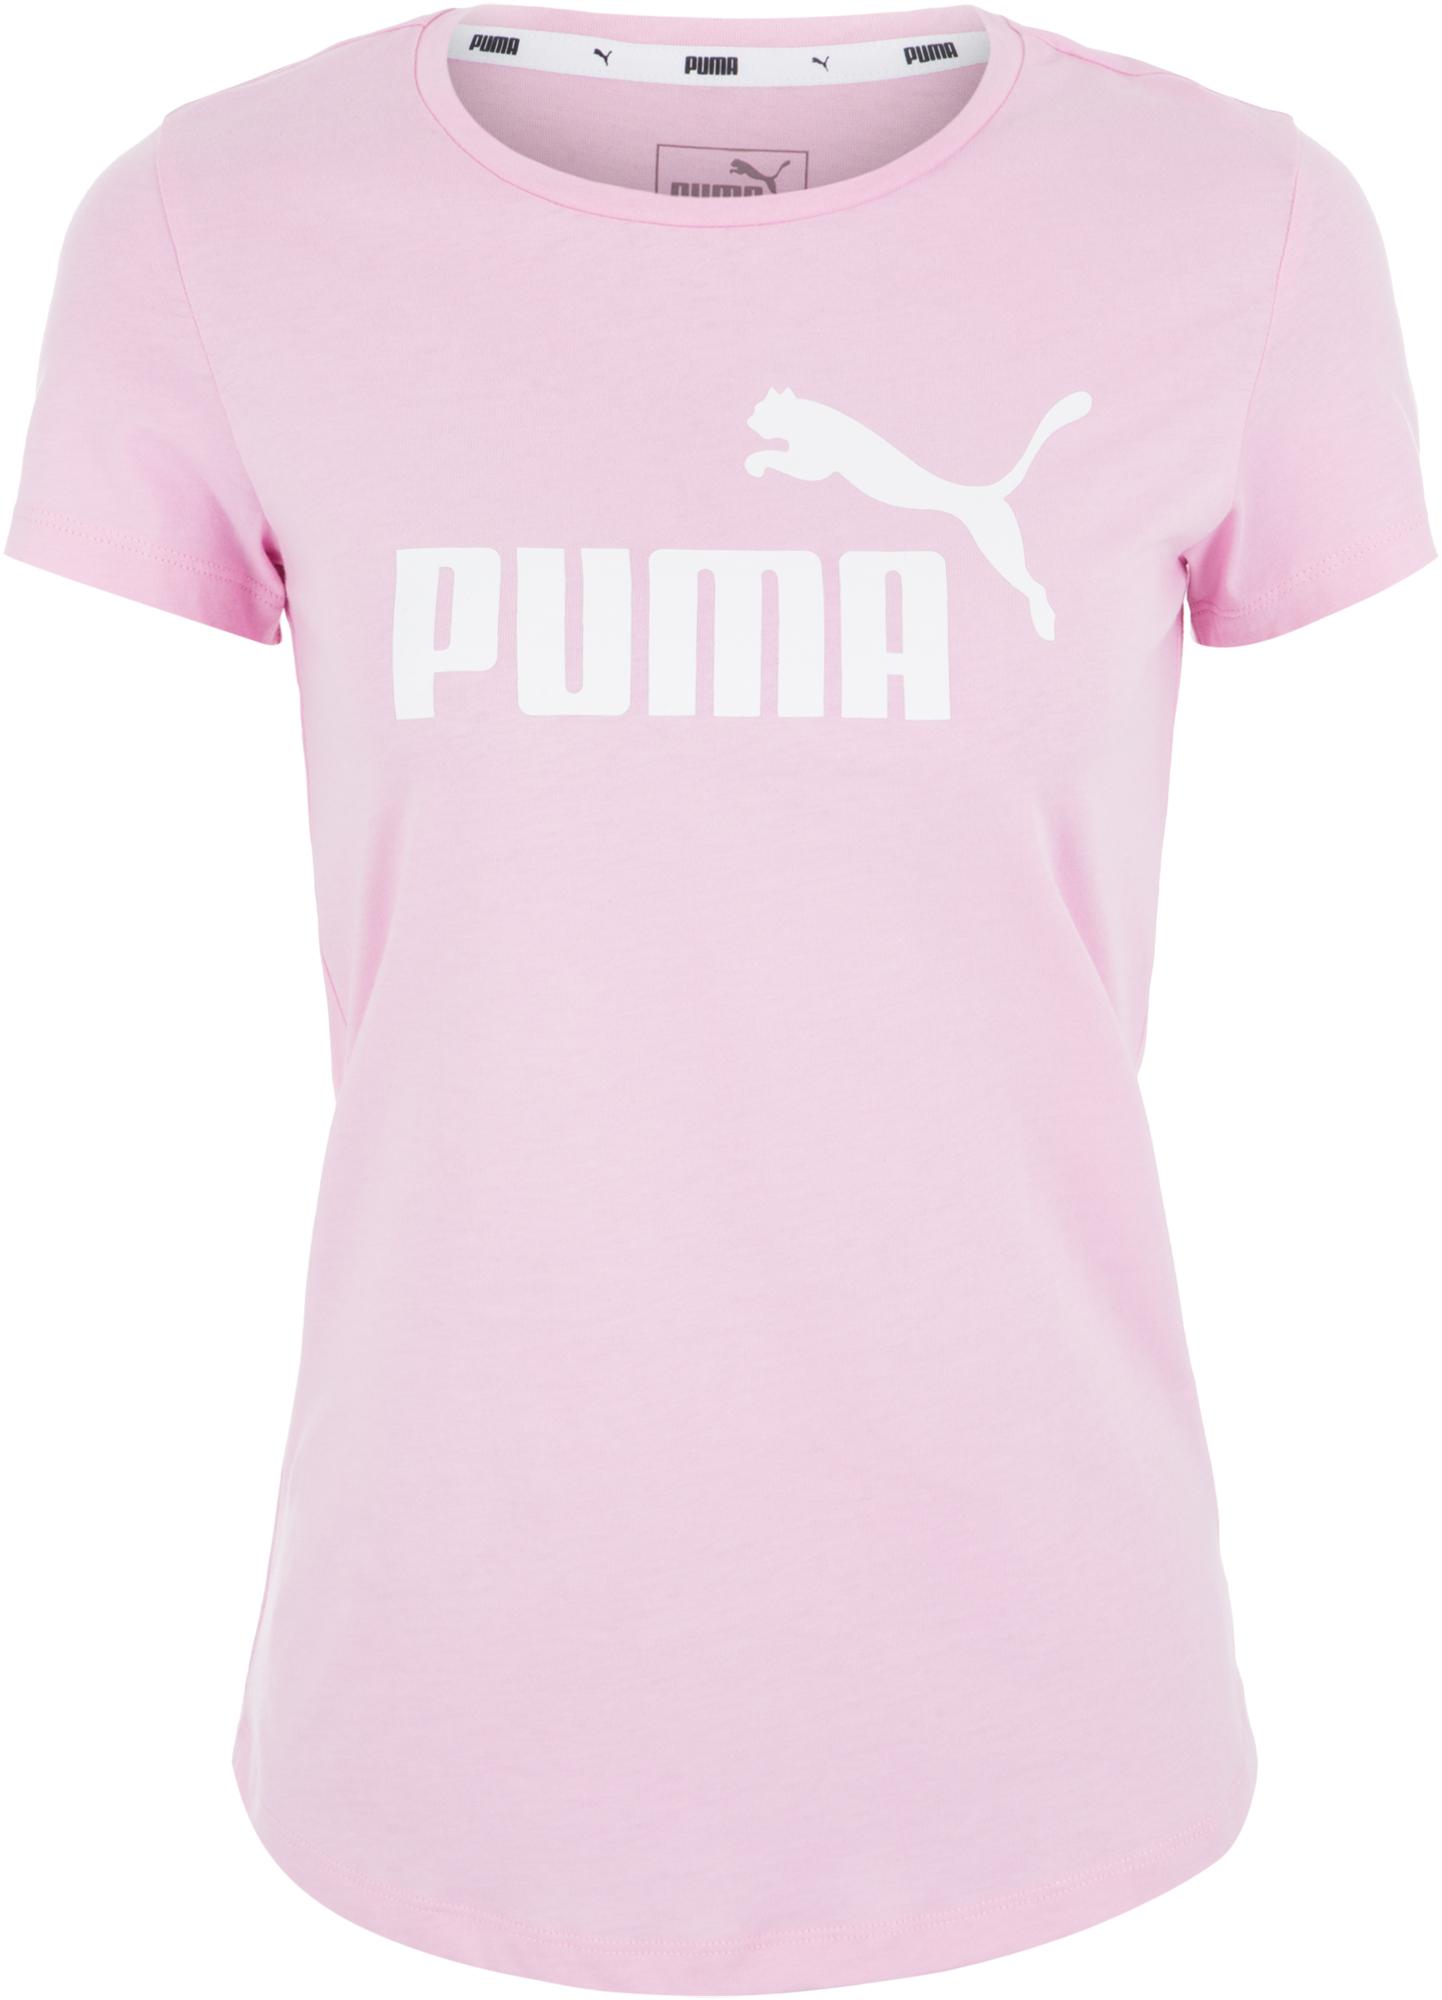 Puma Футболка женская Puma ESS Logo, размер 48-50 цена